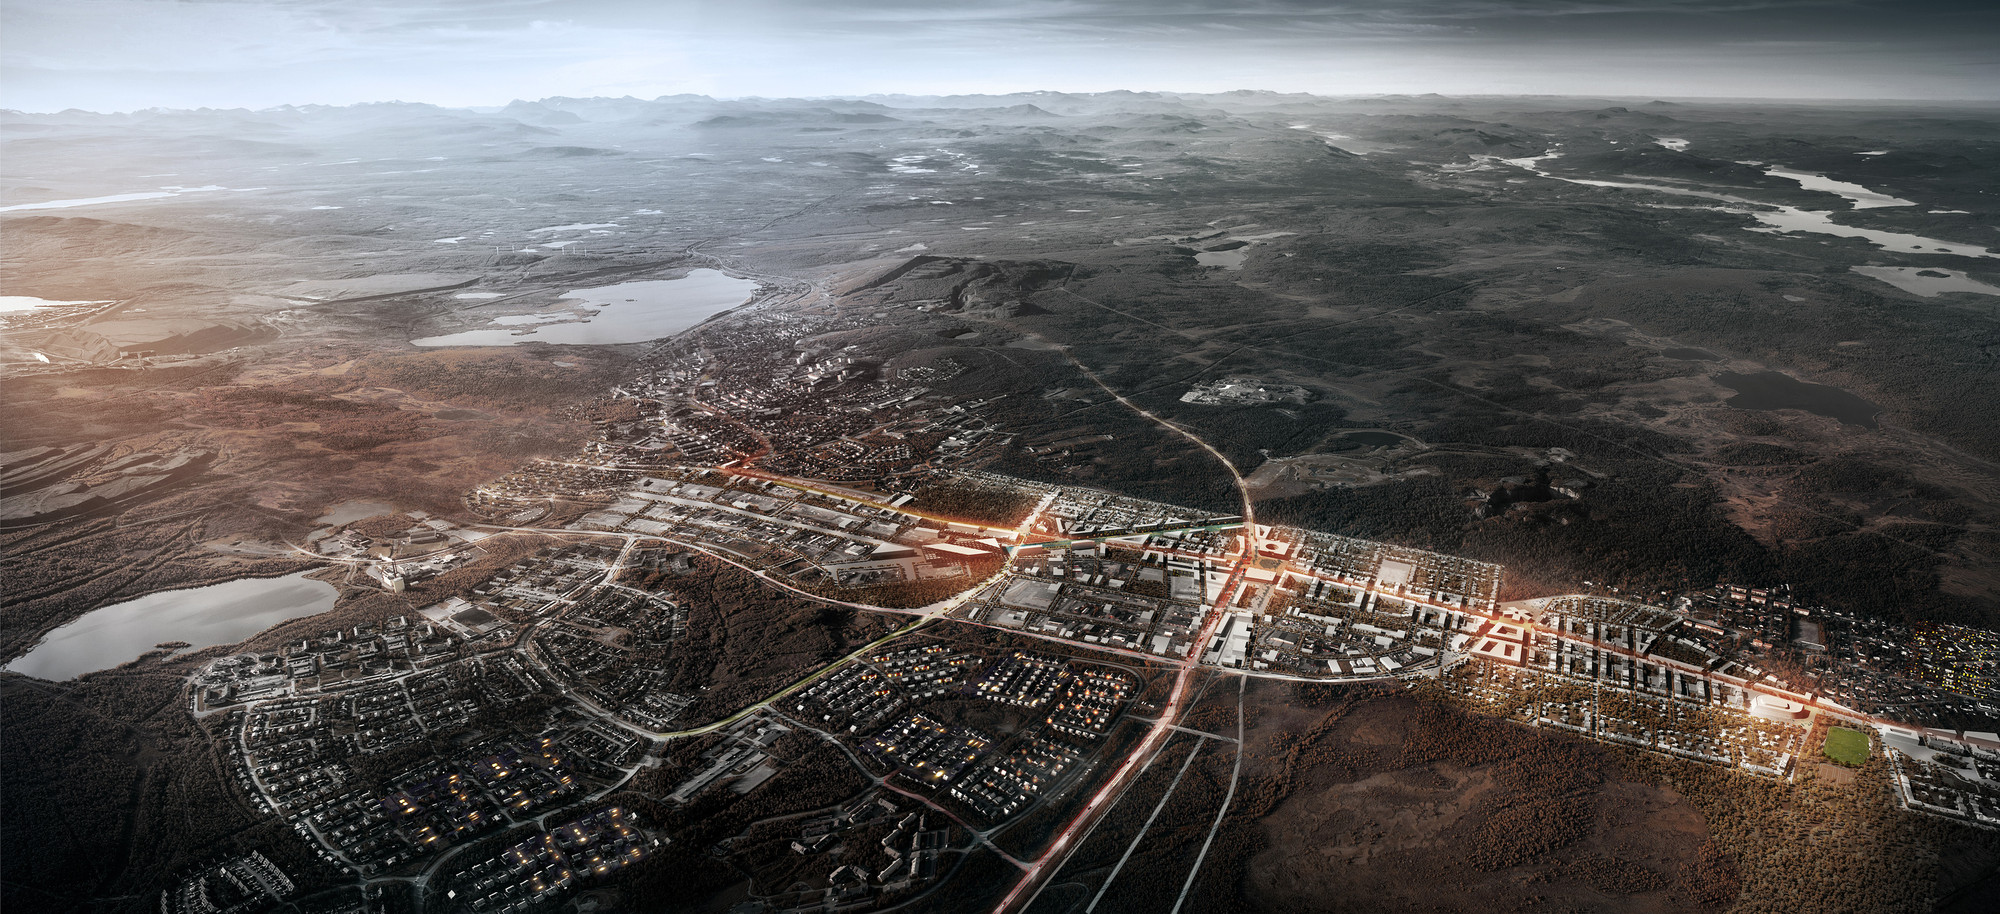 Relocation of the City Center of Kiruna Winning Proposal / White Architects, Courtesy of White Architects